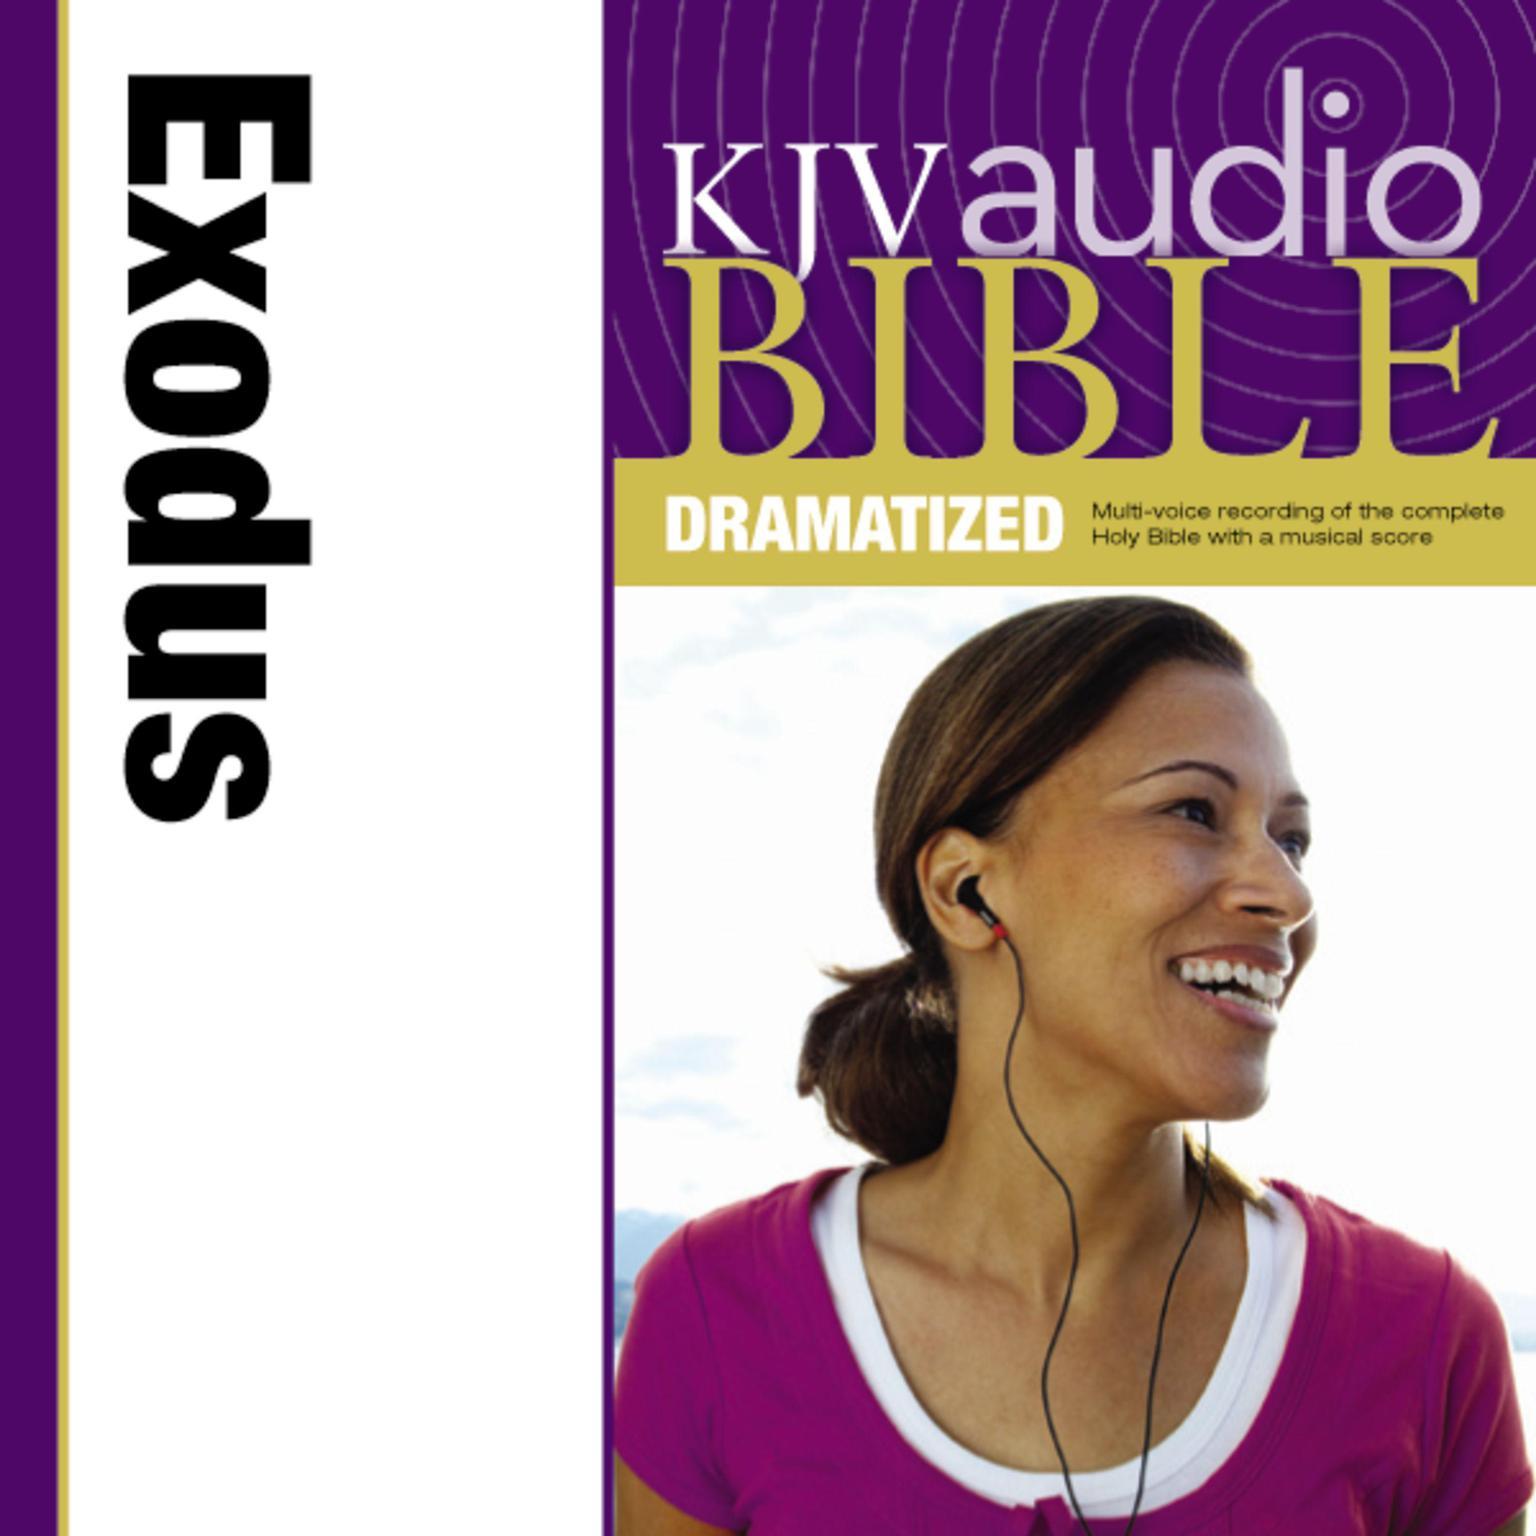 Printable KJV, Audio Bible, Dramatized: Exodus, Audio Download Audiobook Cover Art